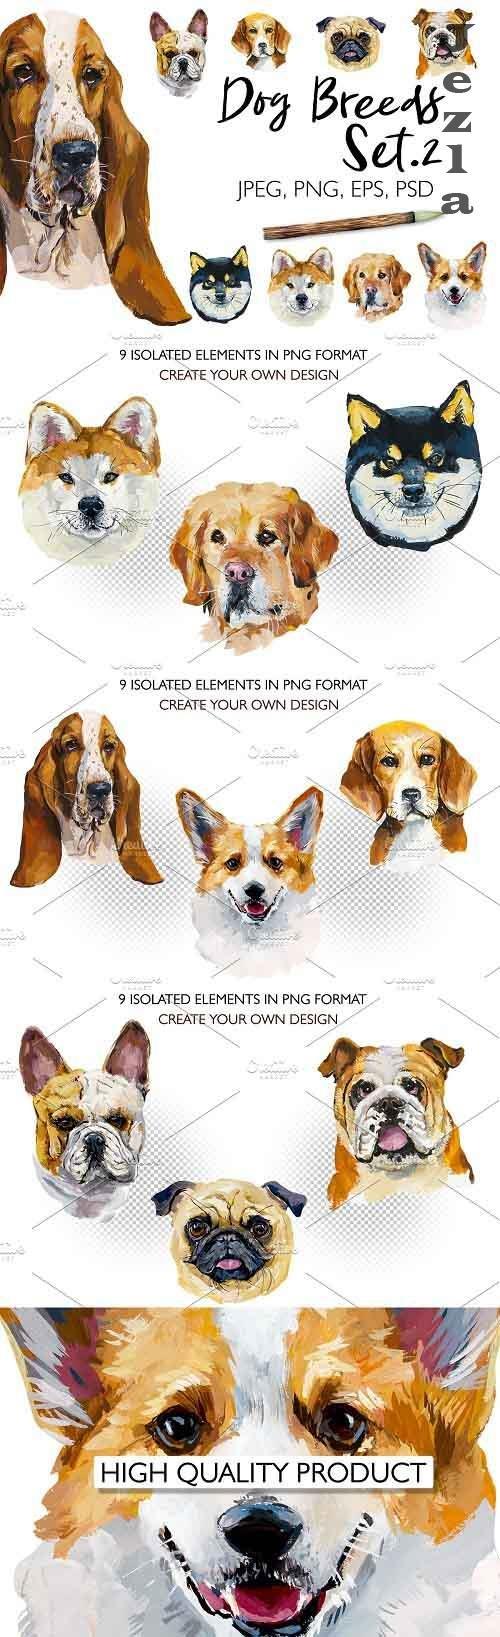 Dog breeds. Set 2 - 4757673